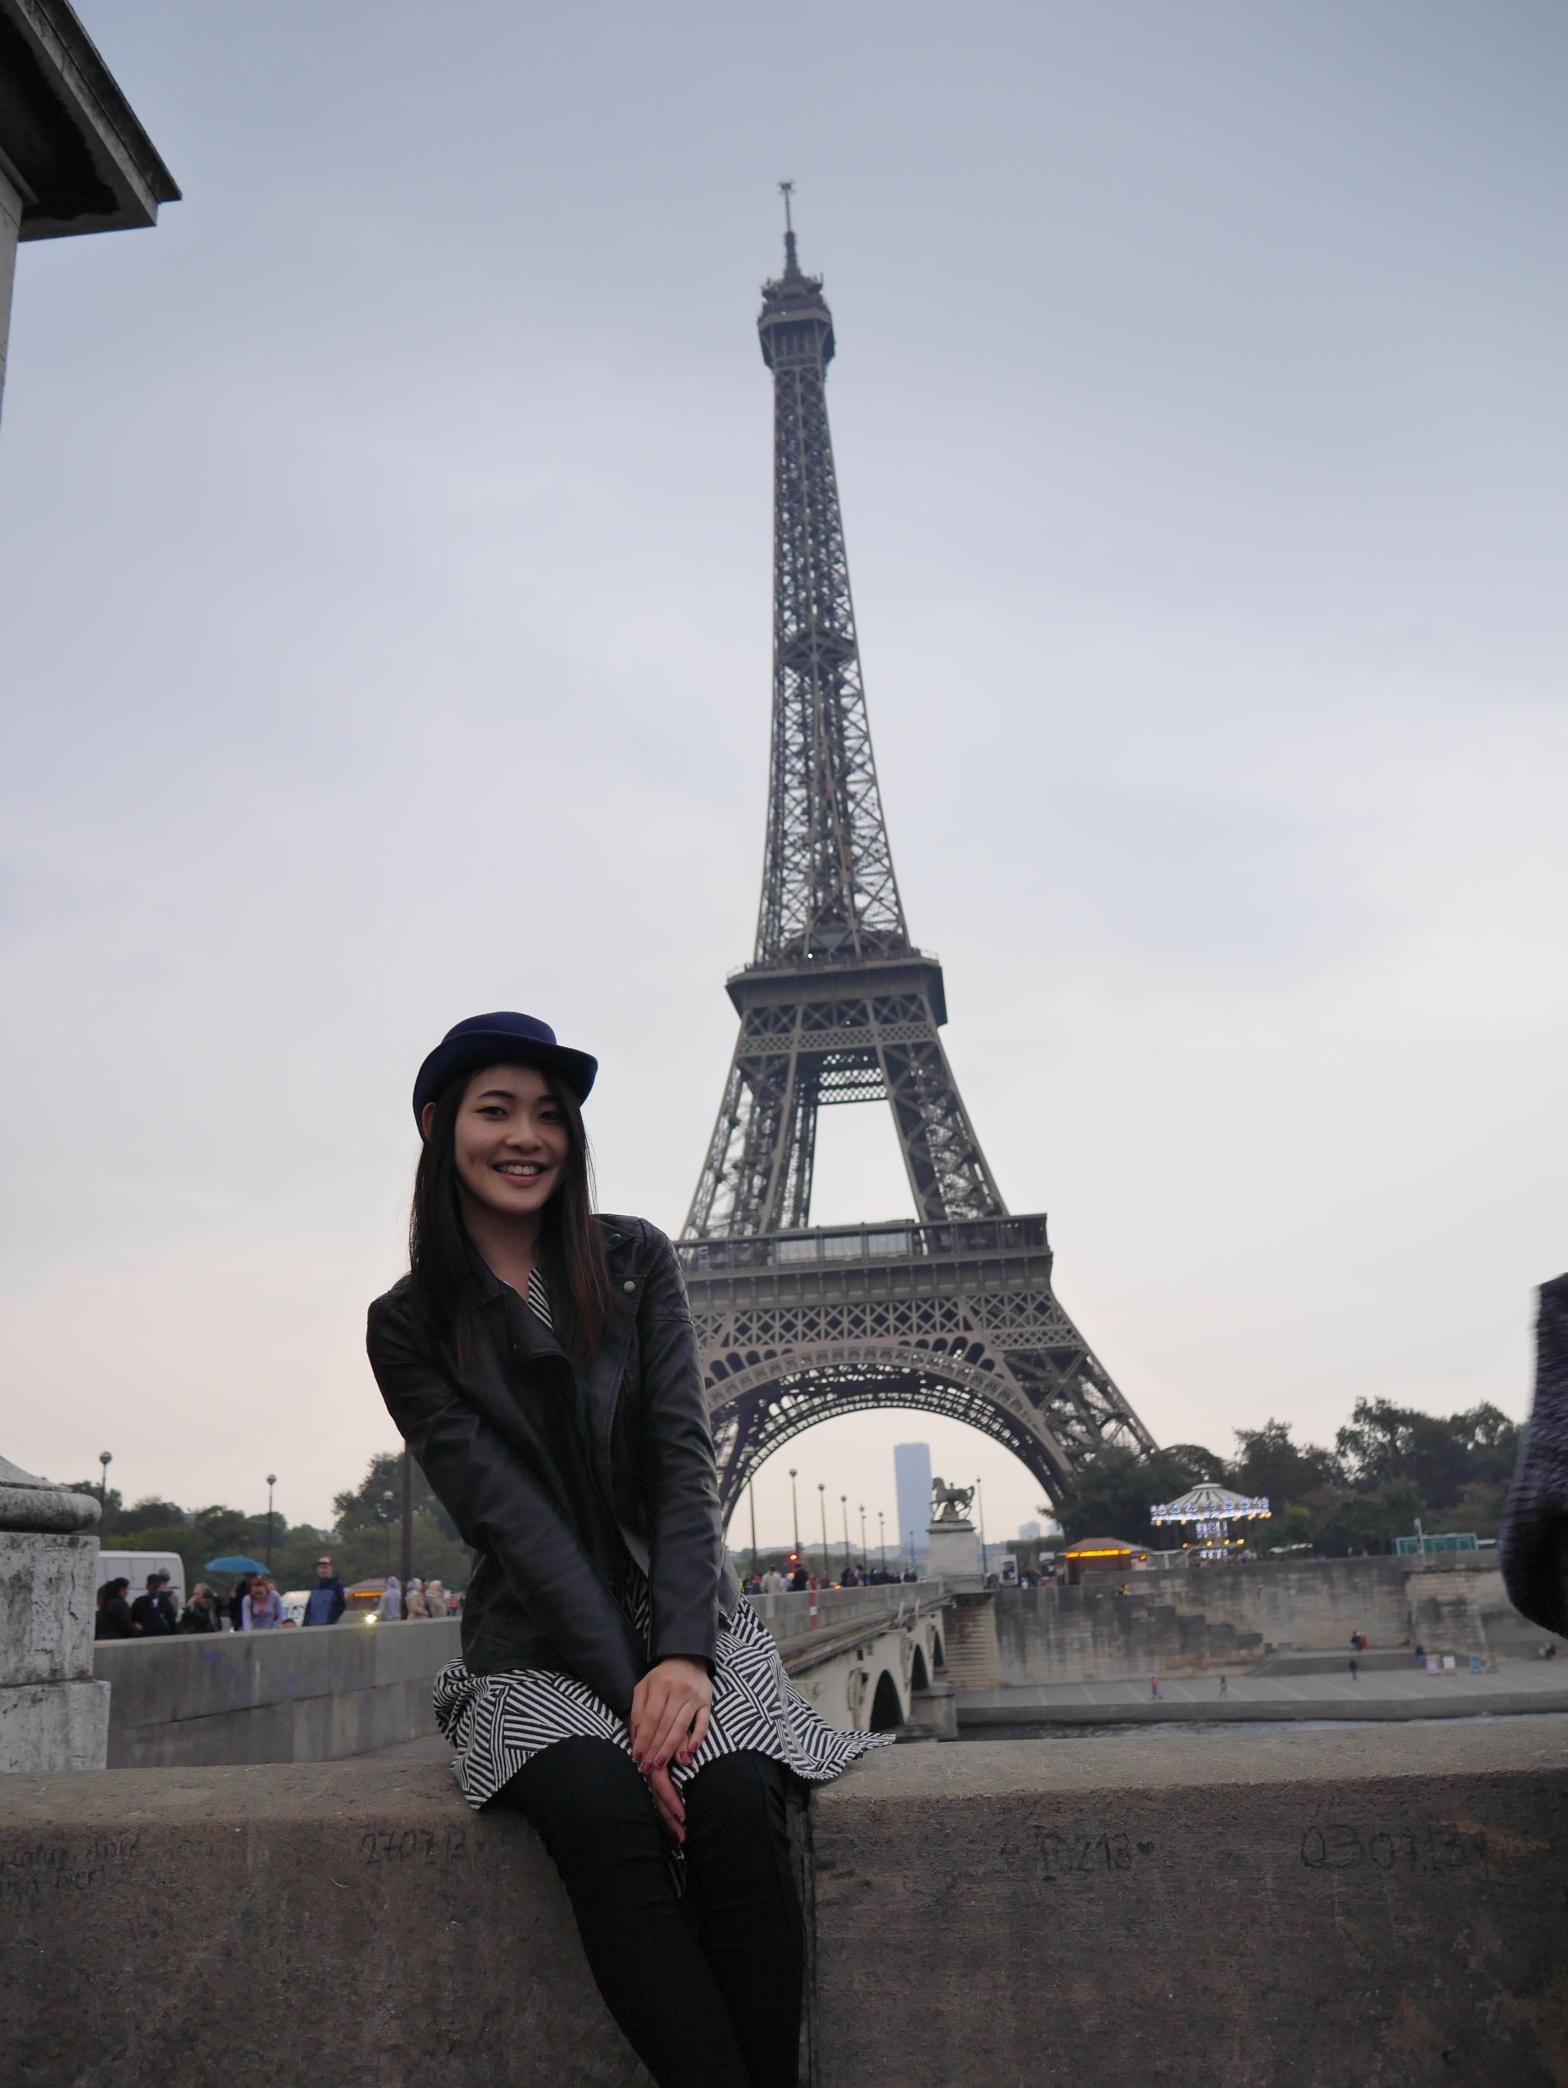 Viktoria Jean in Paris - Eiffel